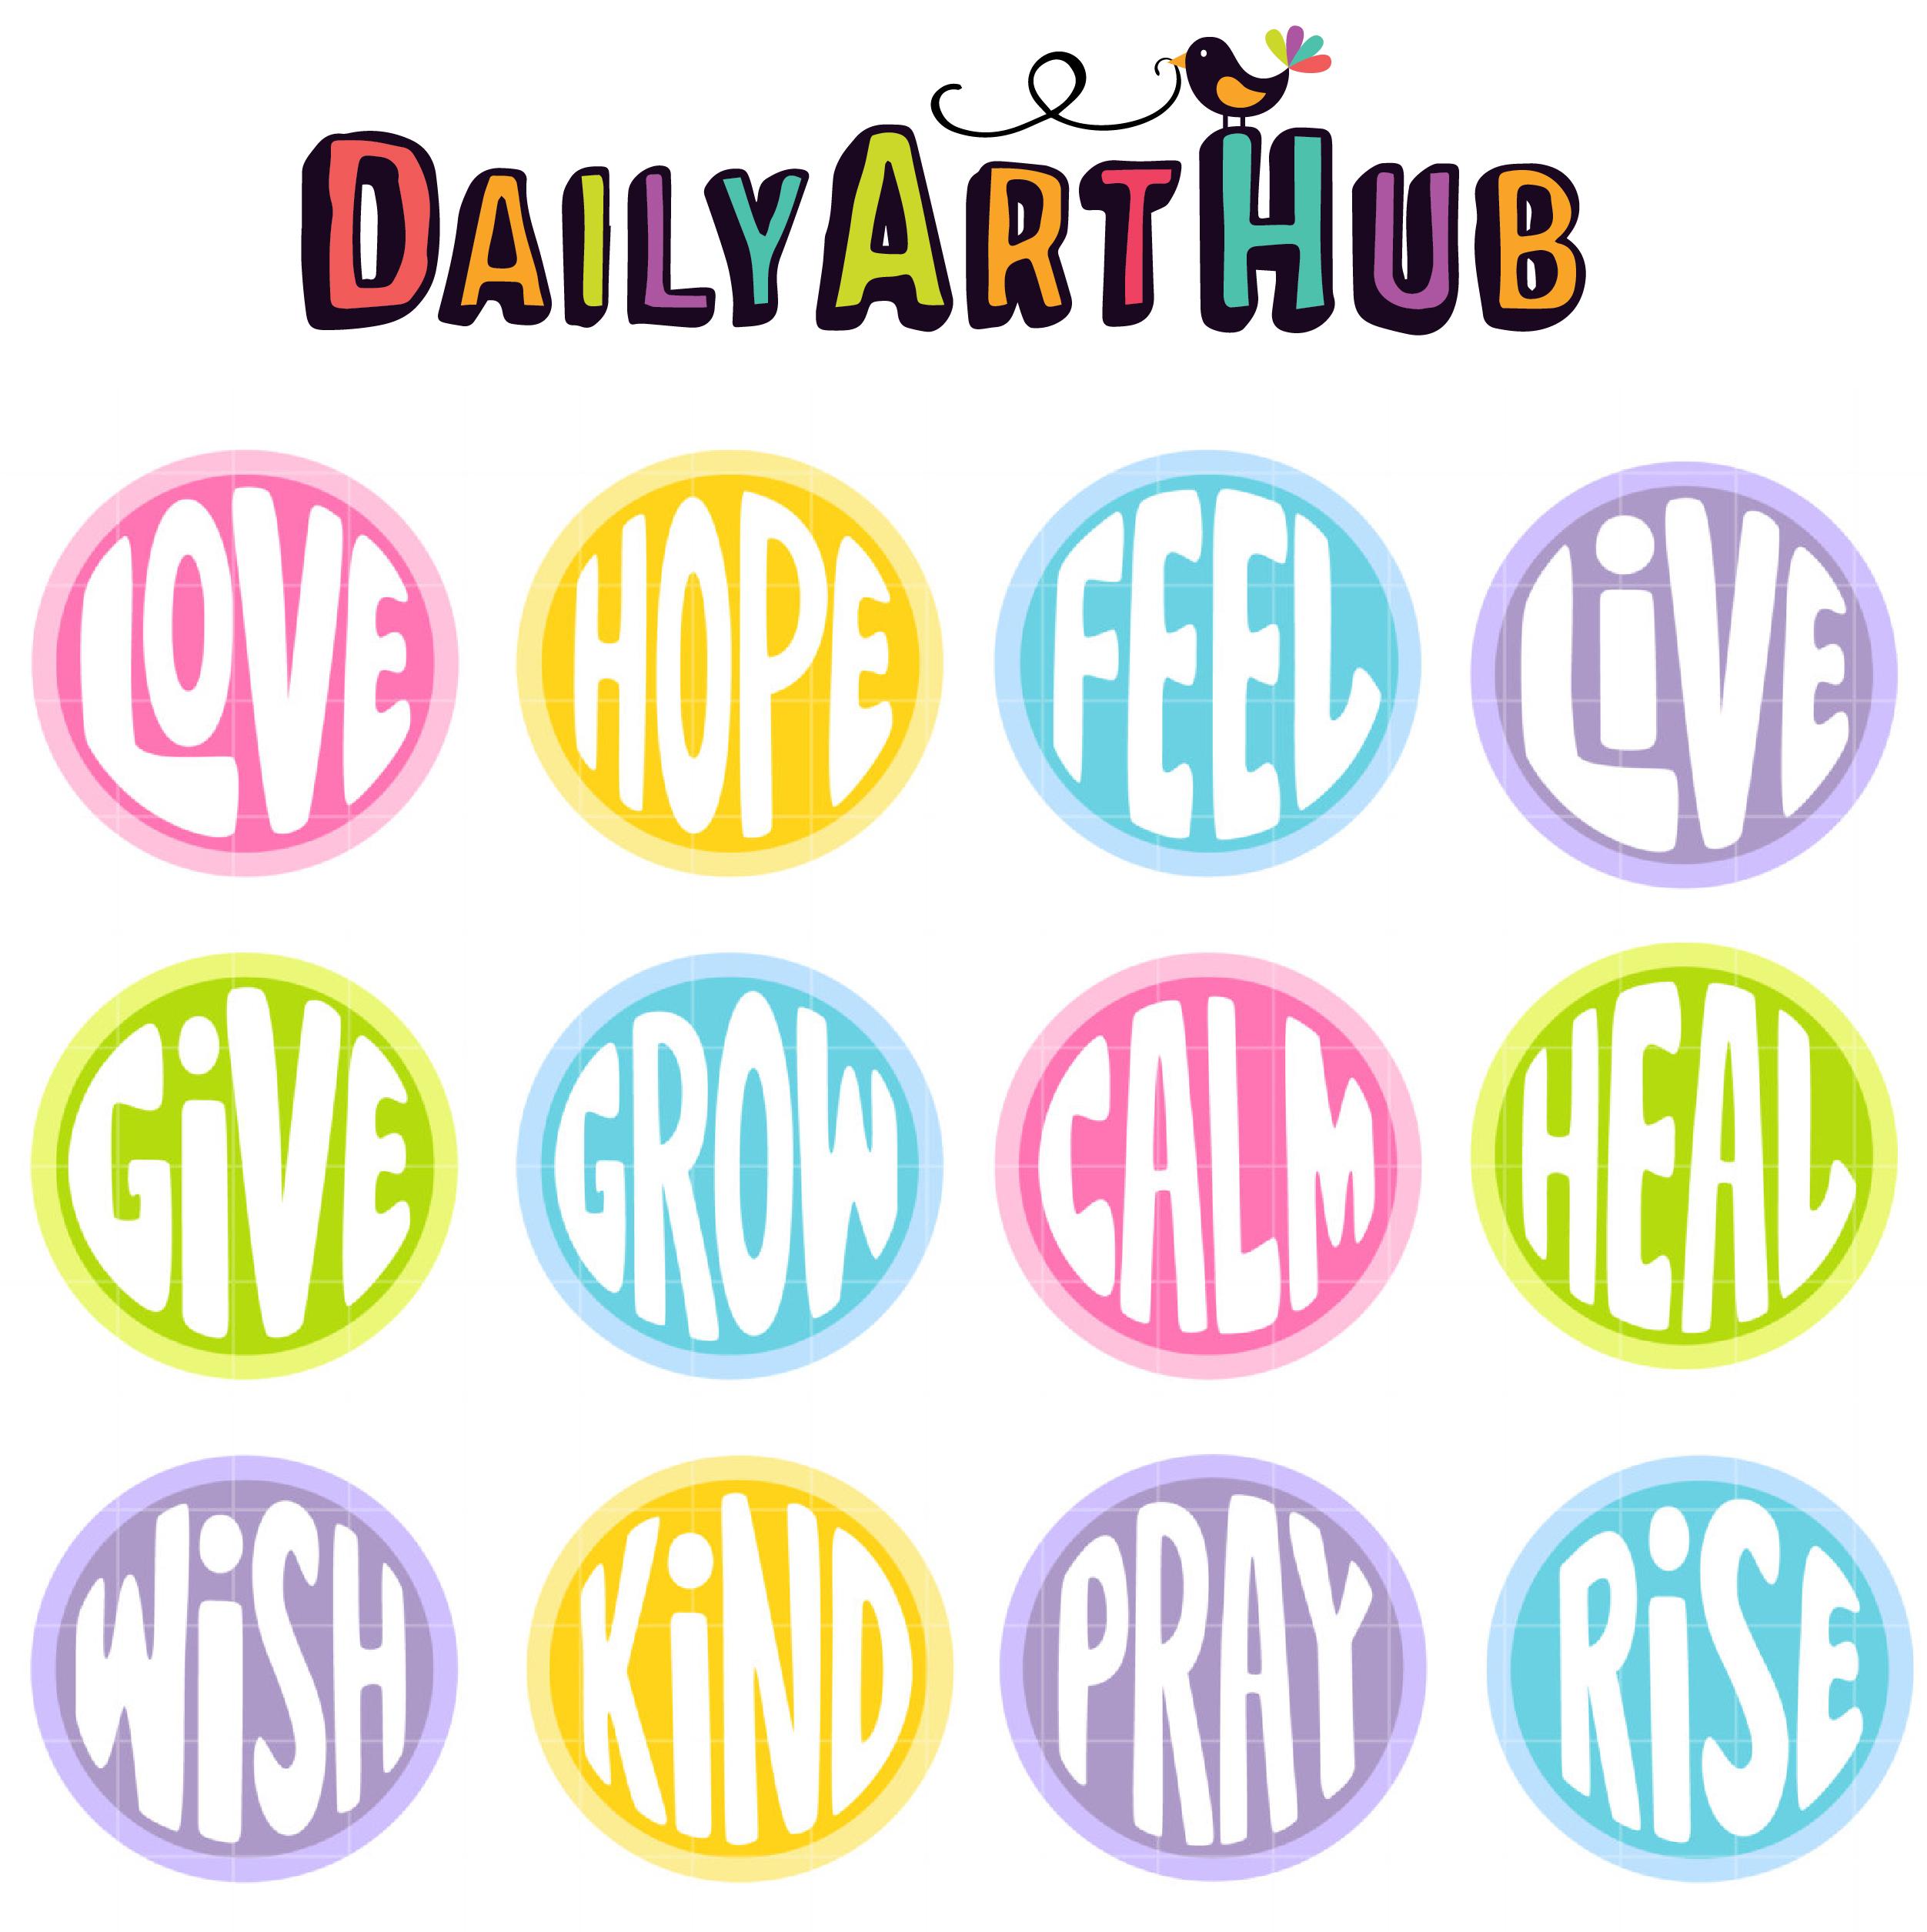 Inspirational Words Free Inspirational Words Clip Art Set  Daily Art Hub  Free Clip